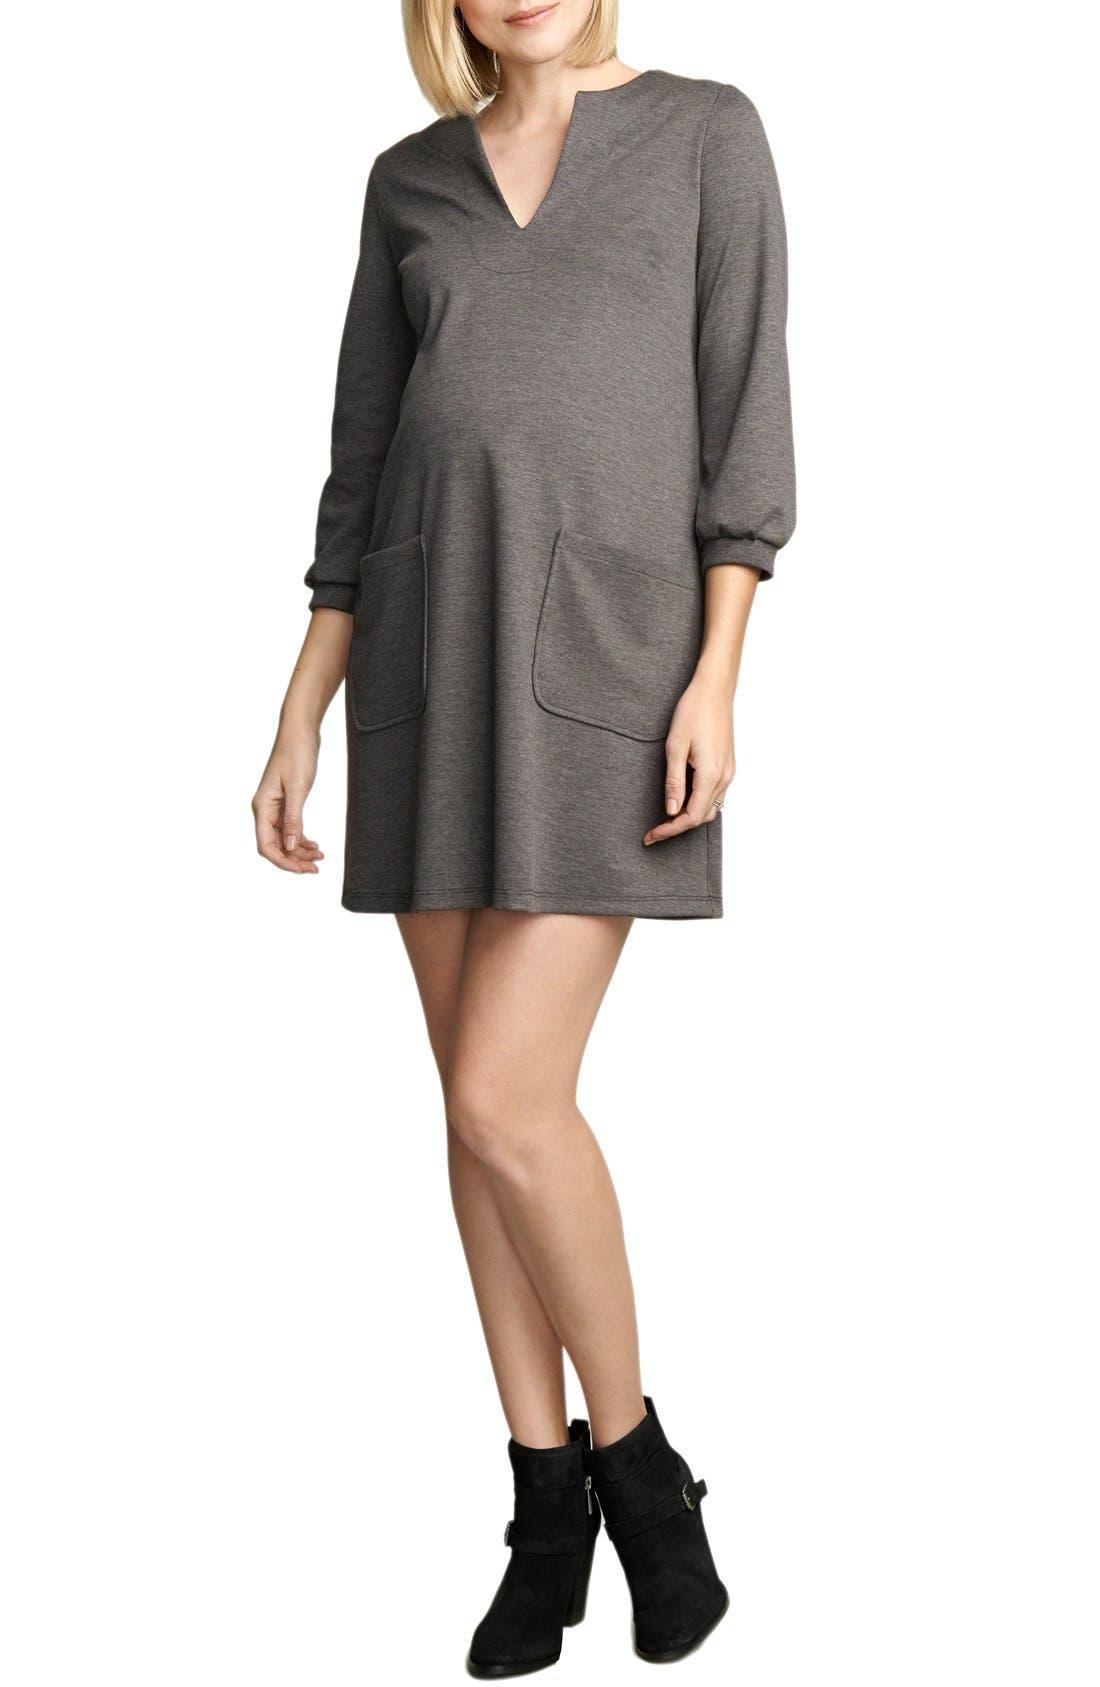 Stripe Maternity Dress,                             Main thumbnail 1, color,                             Heather Charcoal